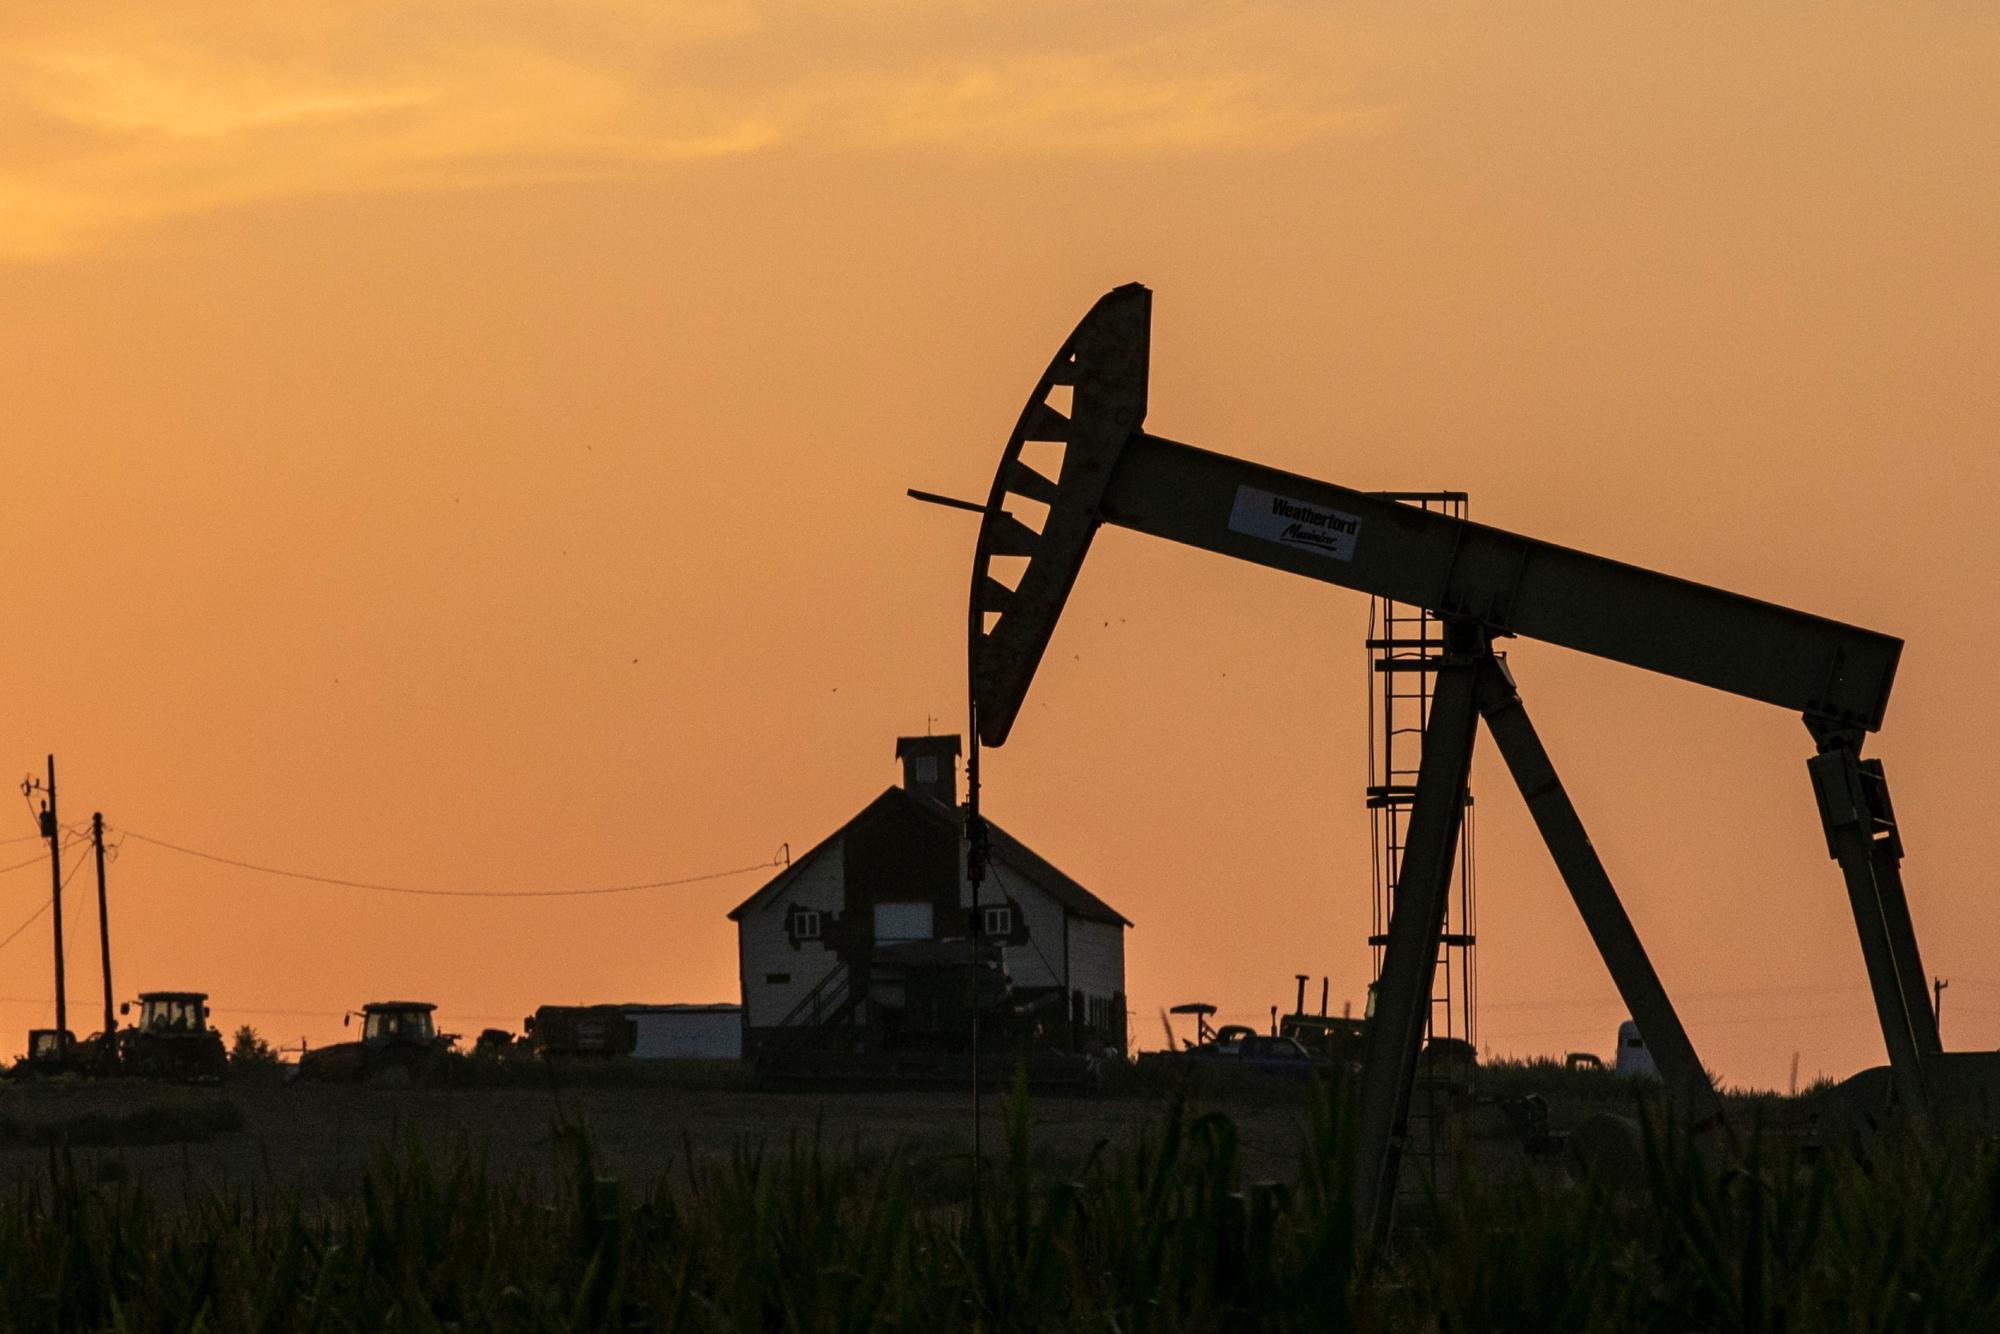 OIL PUMP JACK WELD COUNTY